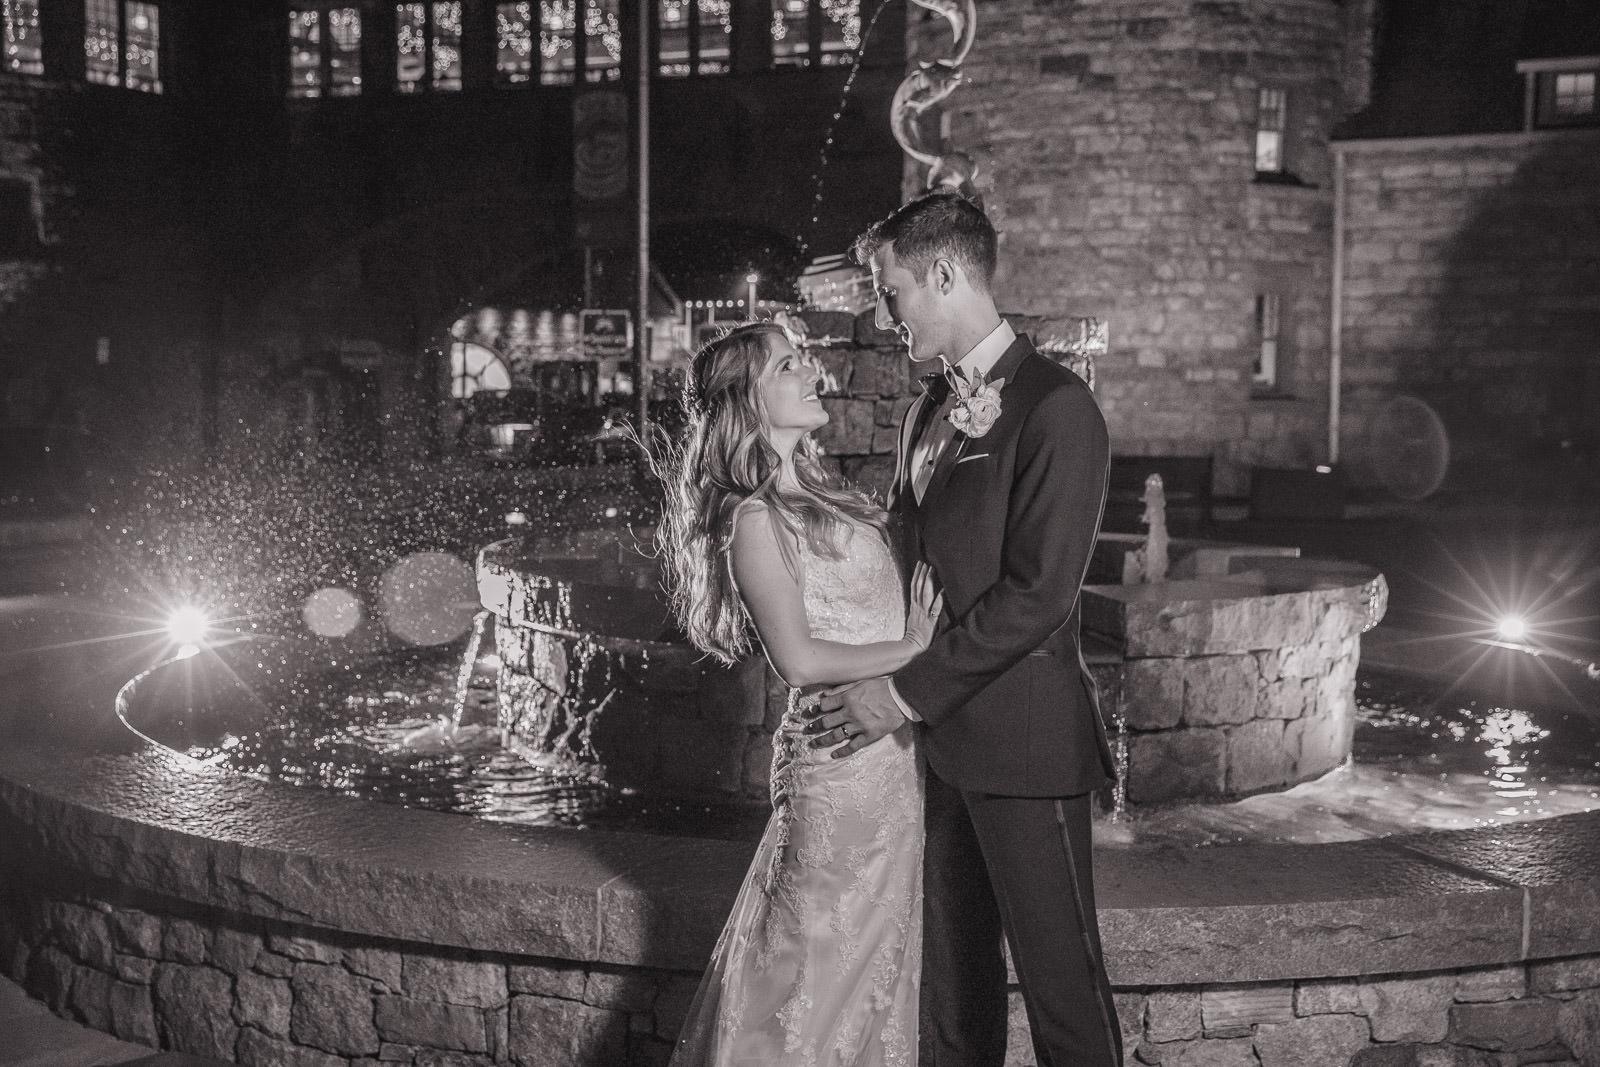 Wedding, Narragansett Towers, The Towers, Narragansett, Rhode Island, RI, Tracy Jenkins photography, RI wedding photographer, Rhode Island wedding photographer, couple photos, bride, groom